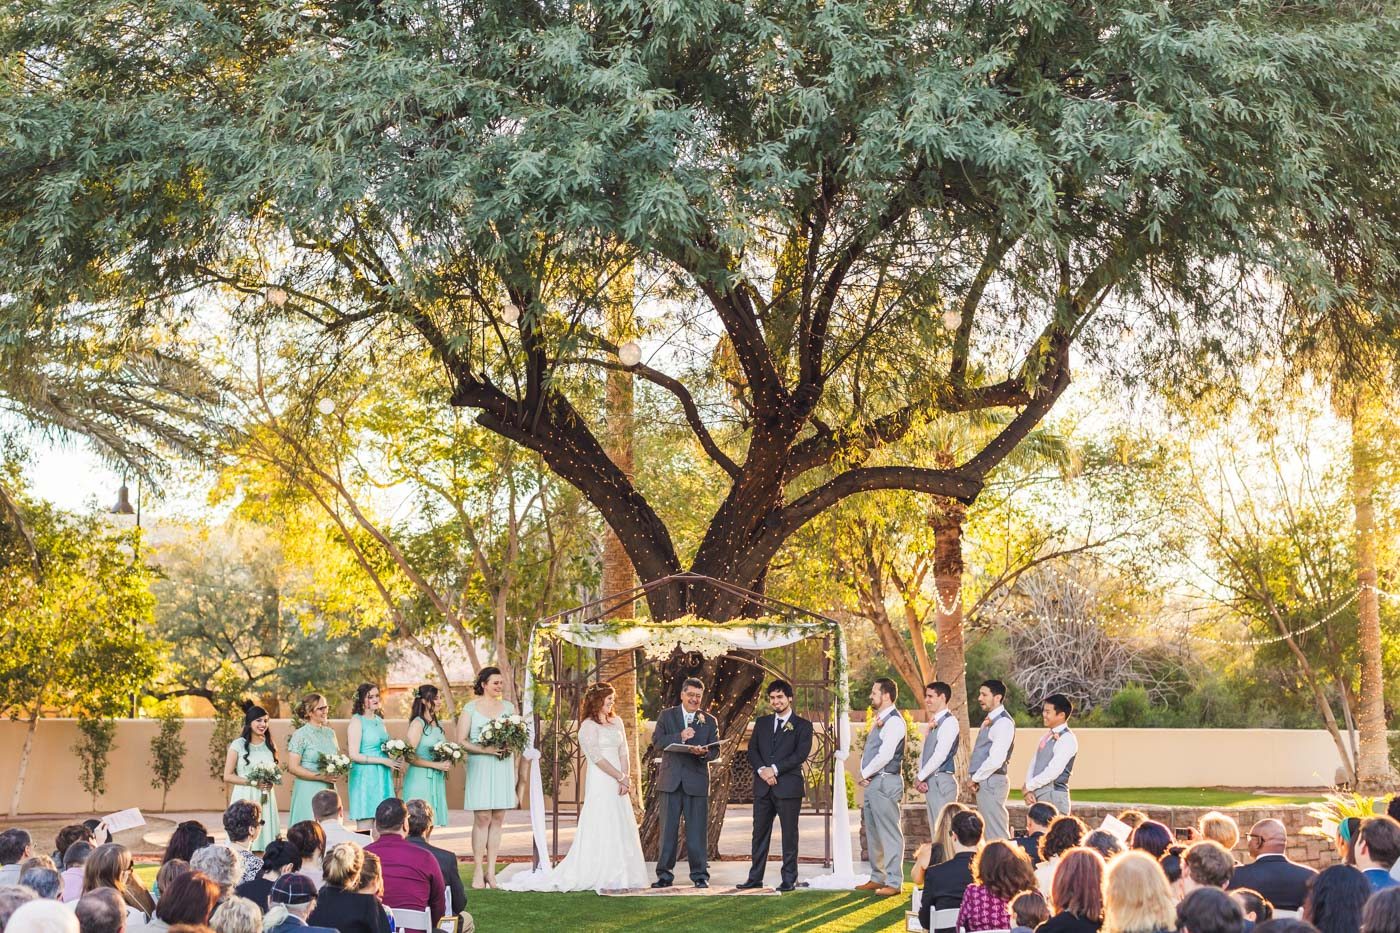 aaron-kes-photography-secret-garden-event-center-wedding-20.jpg